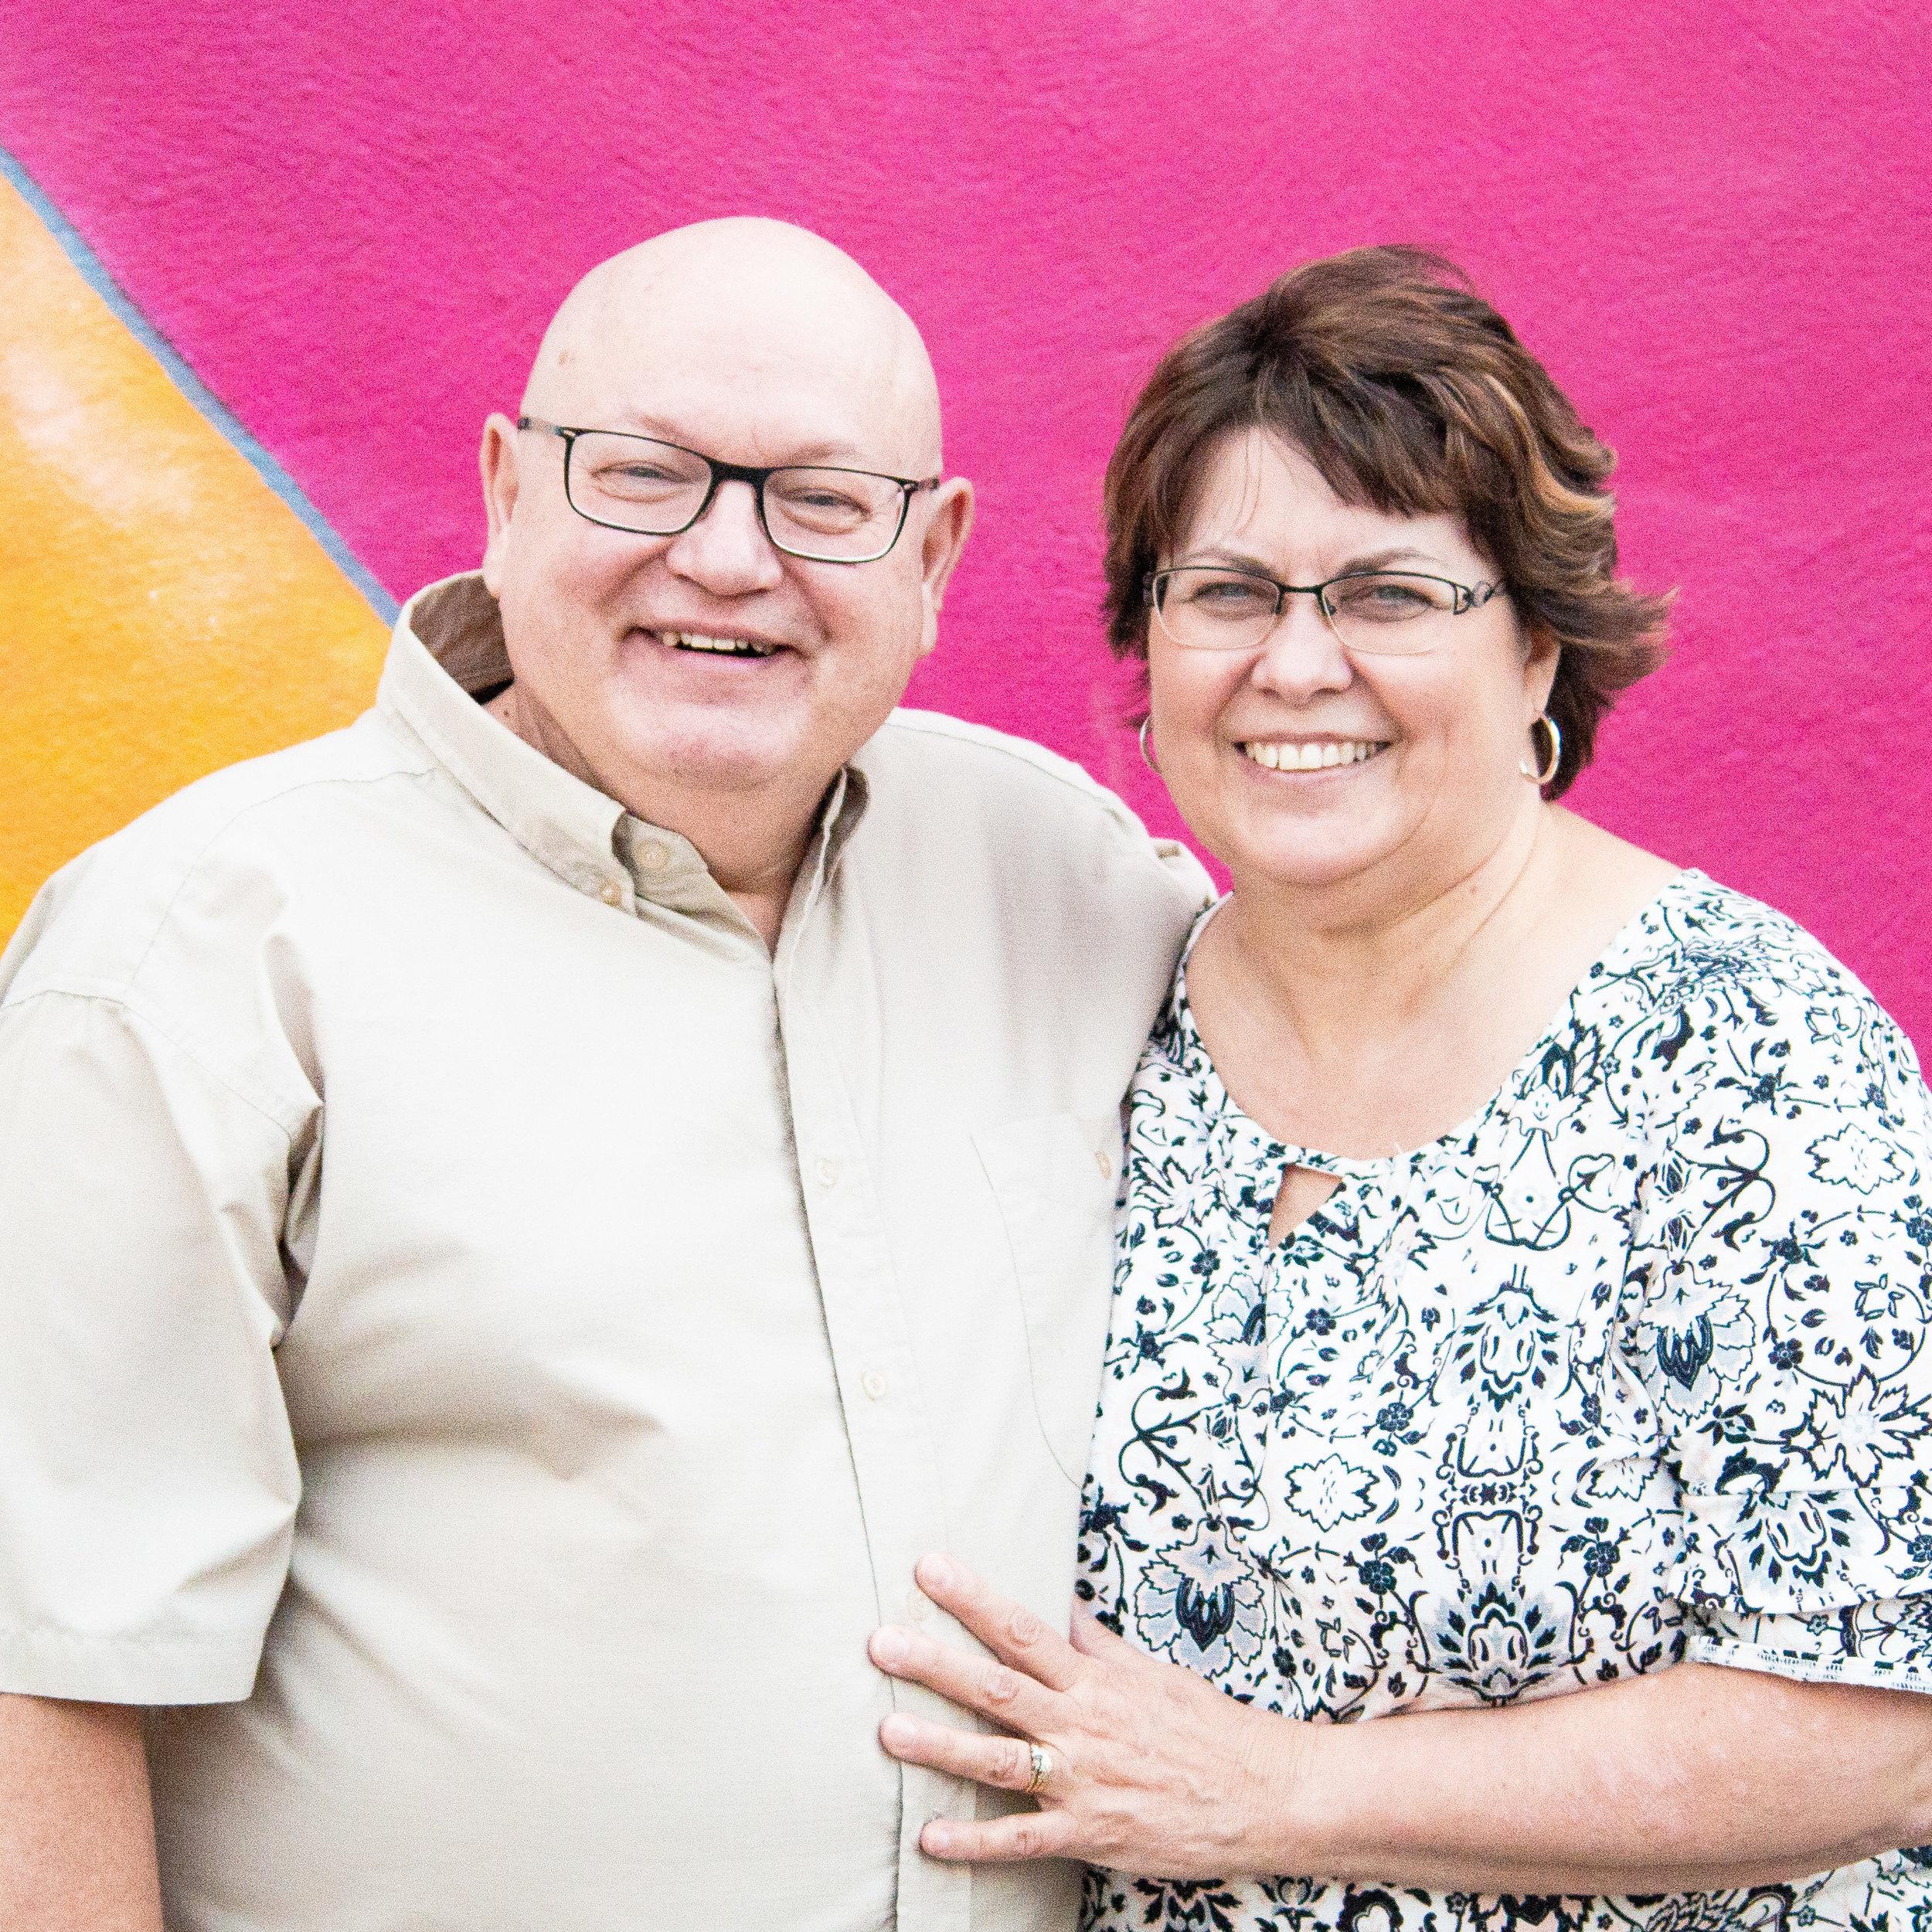 Mark + Debbie - Wednesdays7 pmElmira